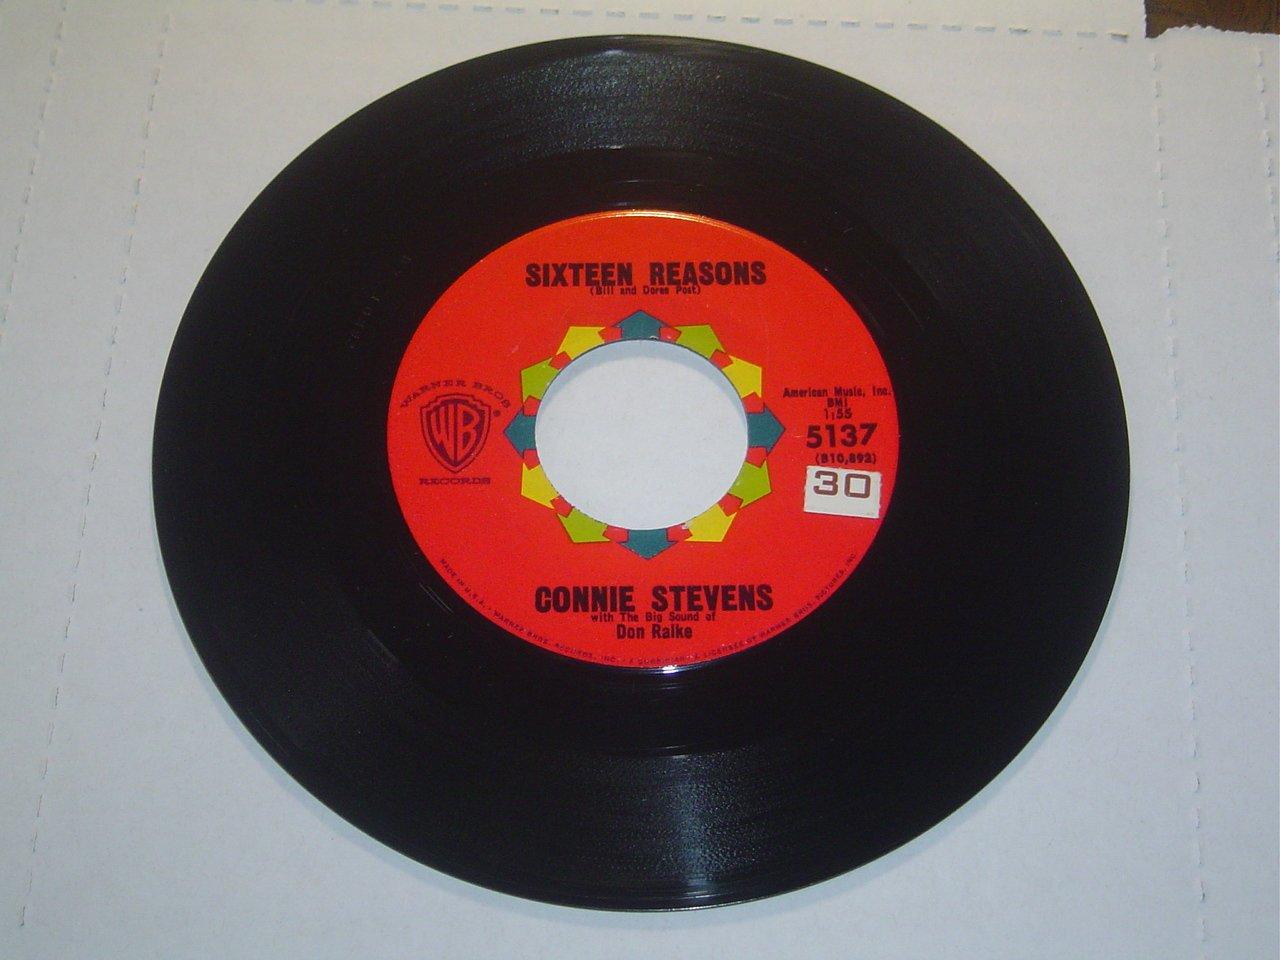 "Connie Stevens: ""Sixteen Reasons"" / ""Little Sister"" - '60 Teener - nice - pl NM!"